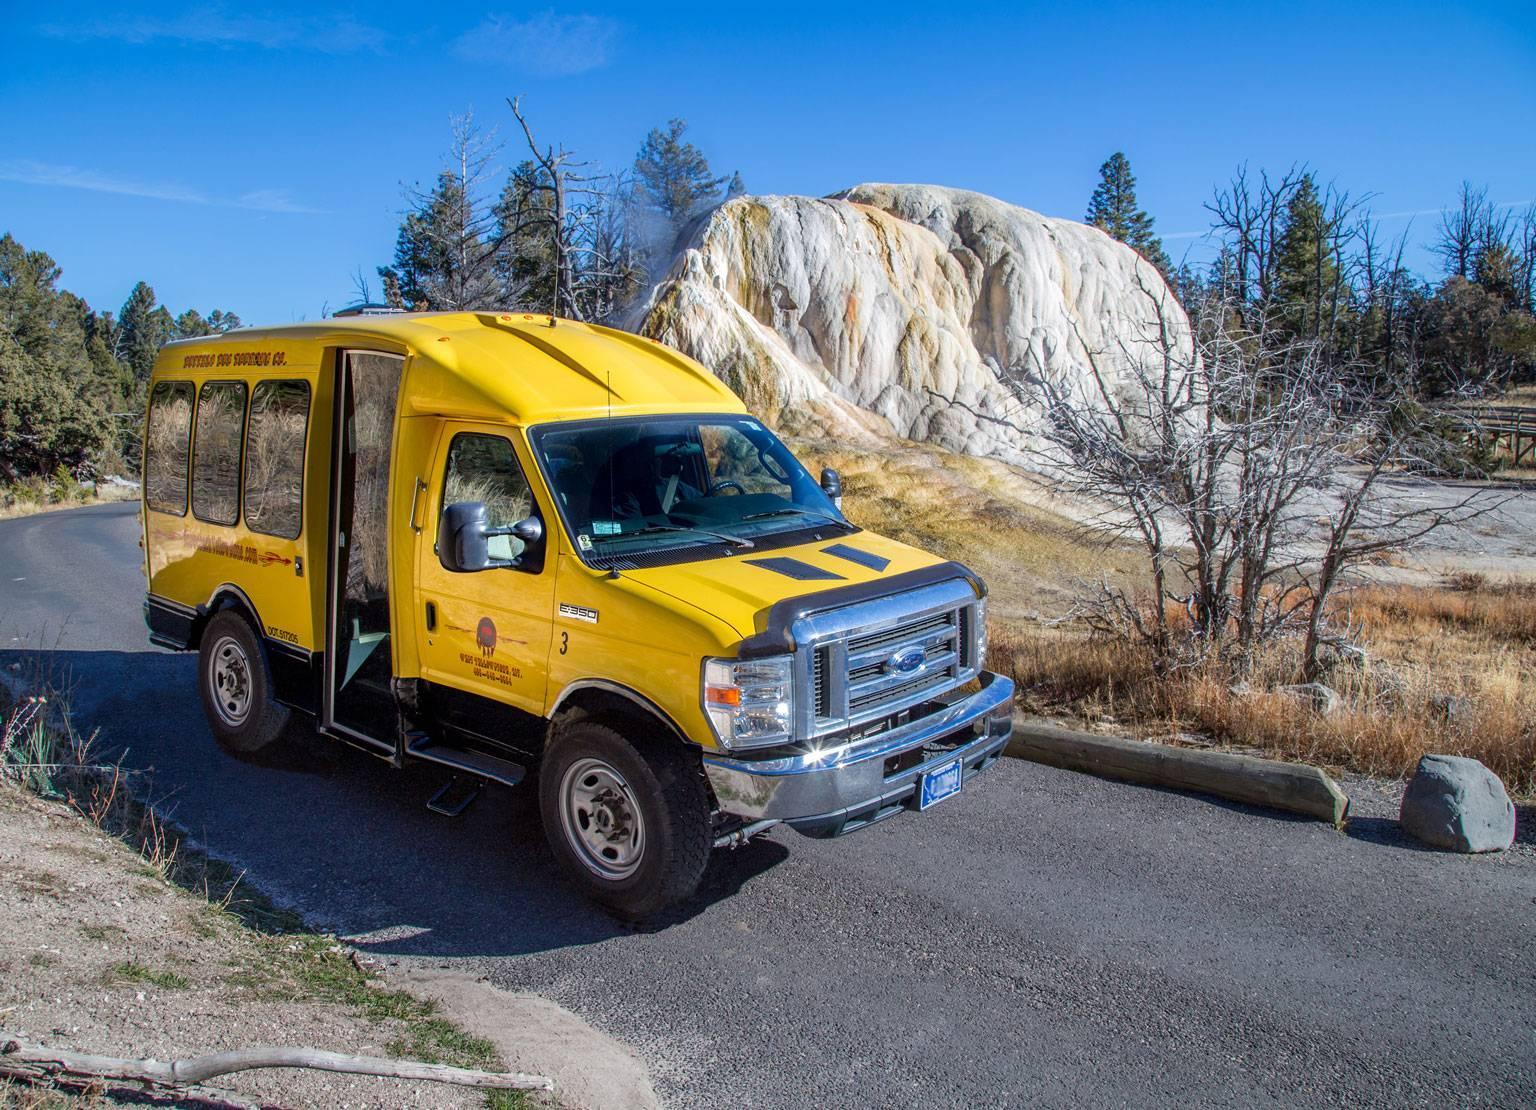 Yellowstone lodging hotels cabins visit yellowstone park for Cabina explorer west yellowstone